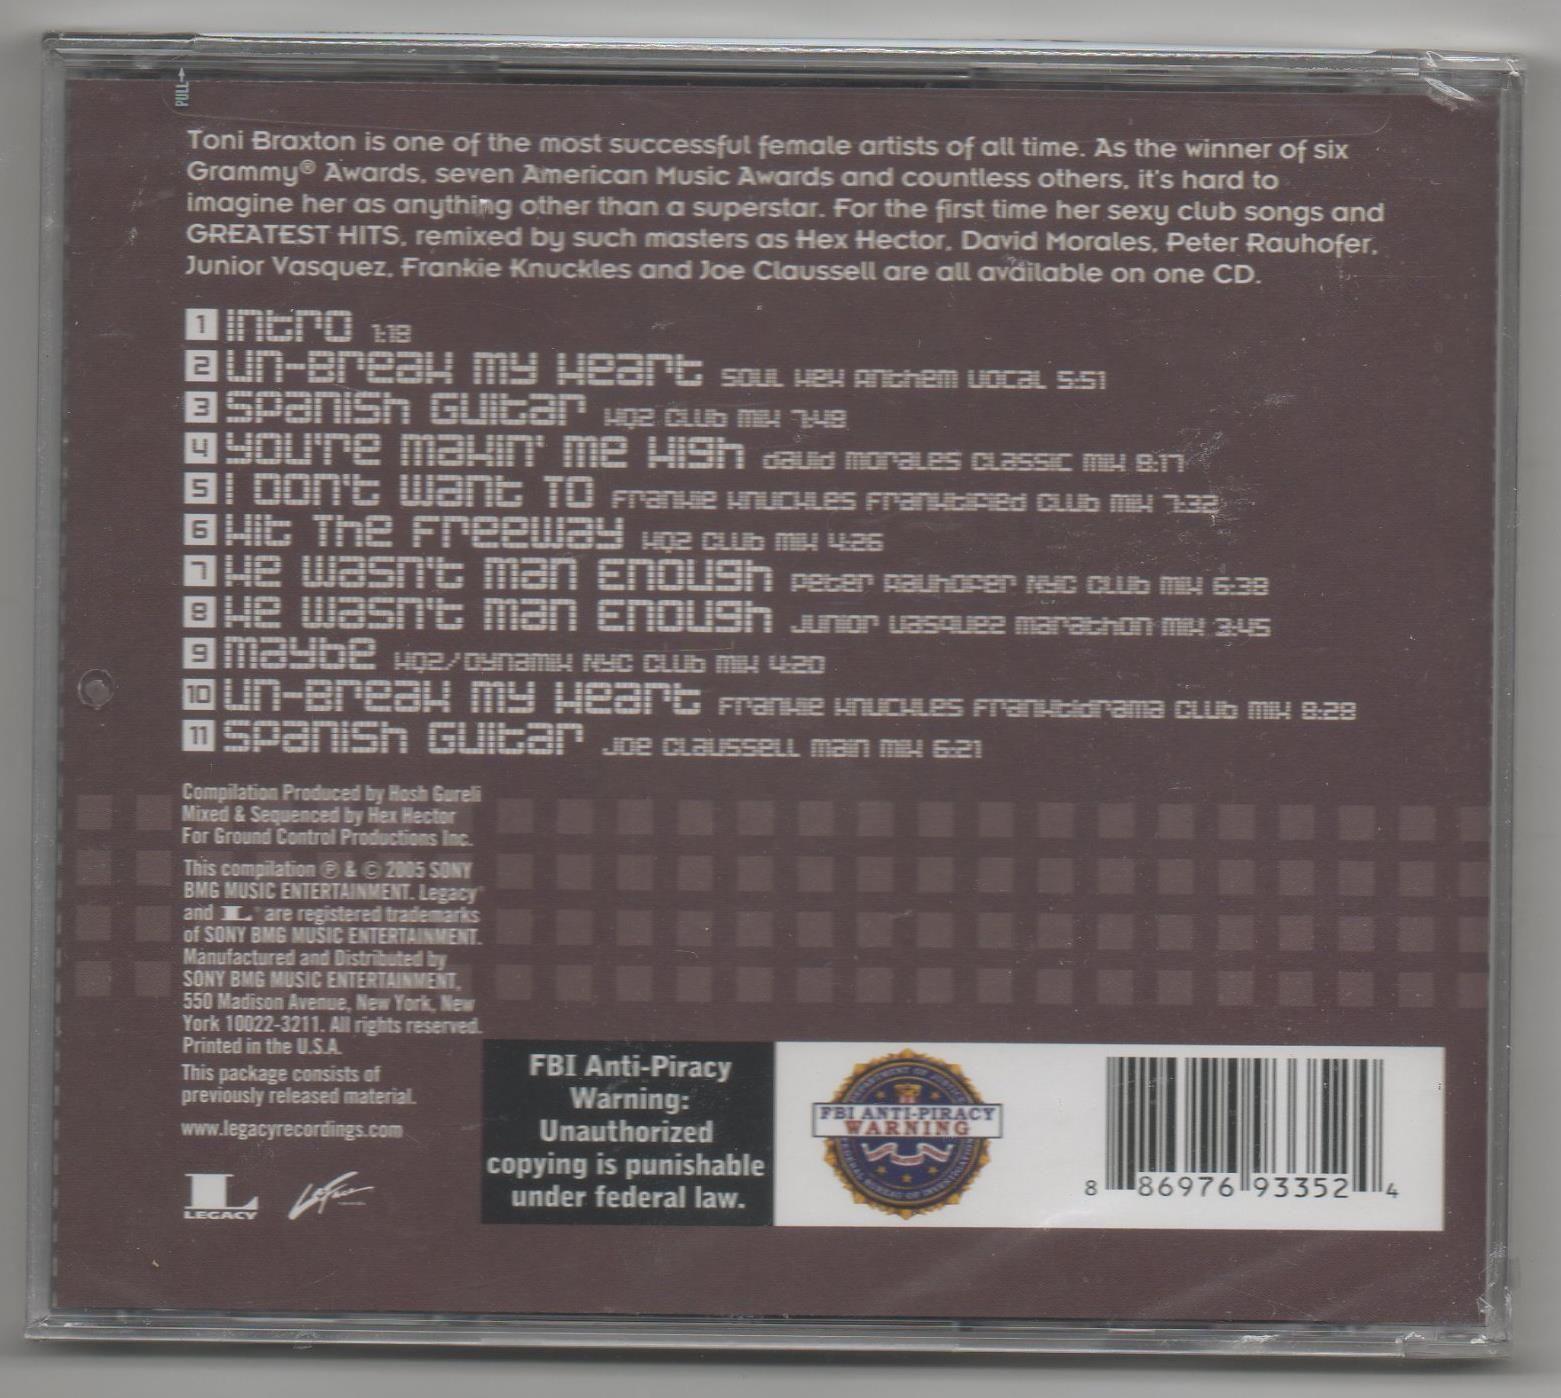 Toni Braxton Un-Break My Heart: The Remix Collection 2005 CD